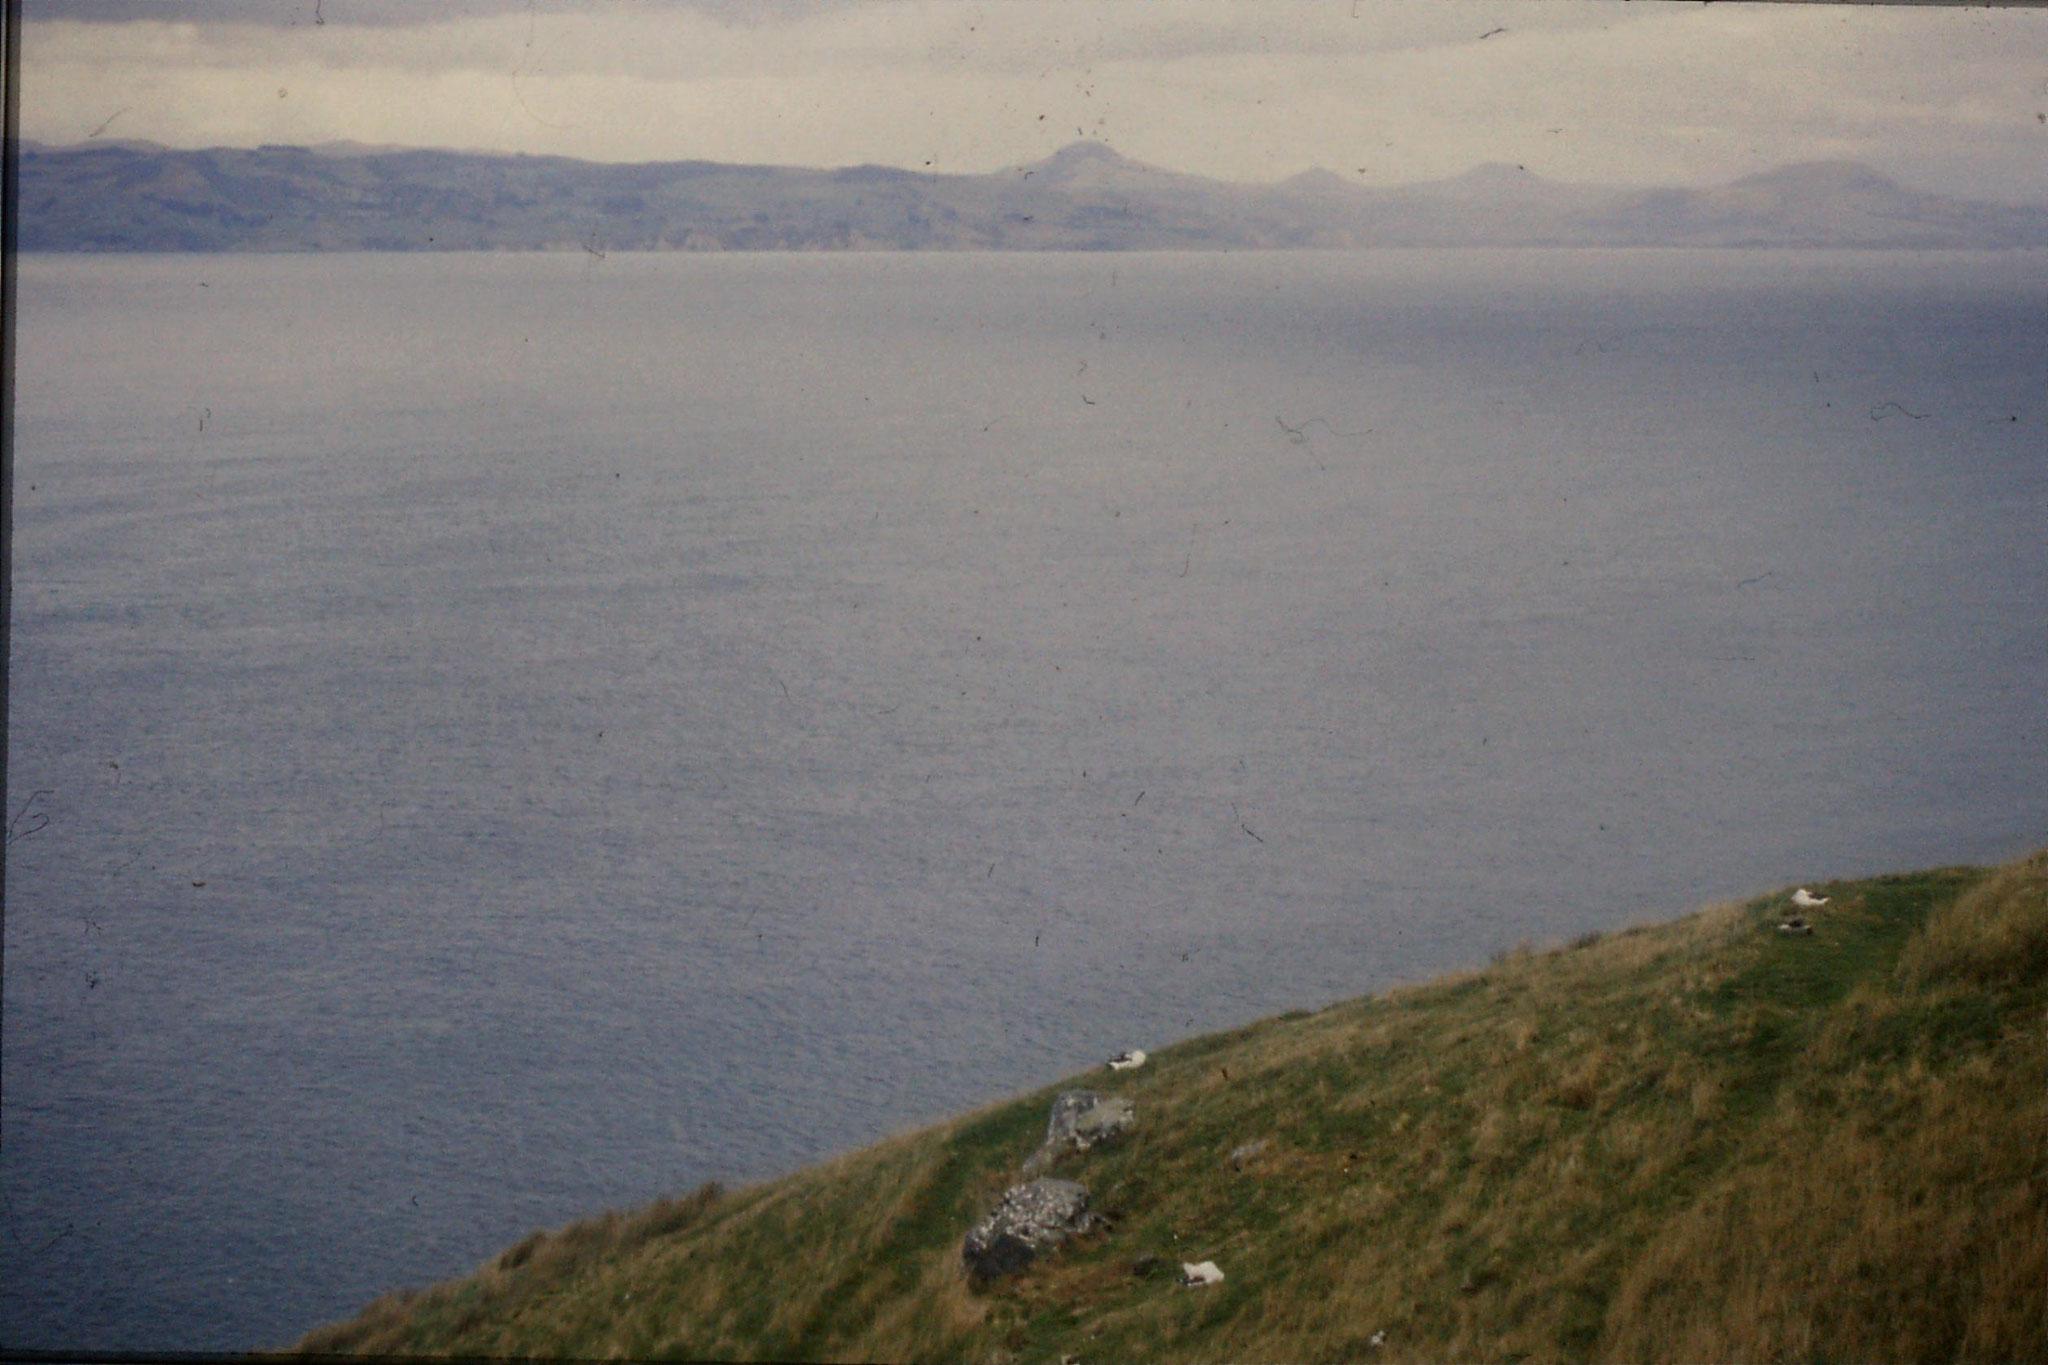 18/8/1990: 13: Dunedin, albatross colony